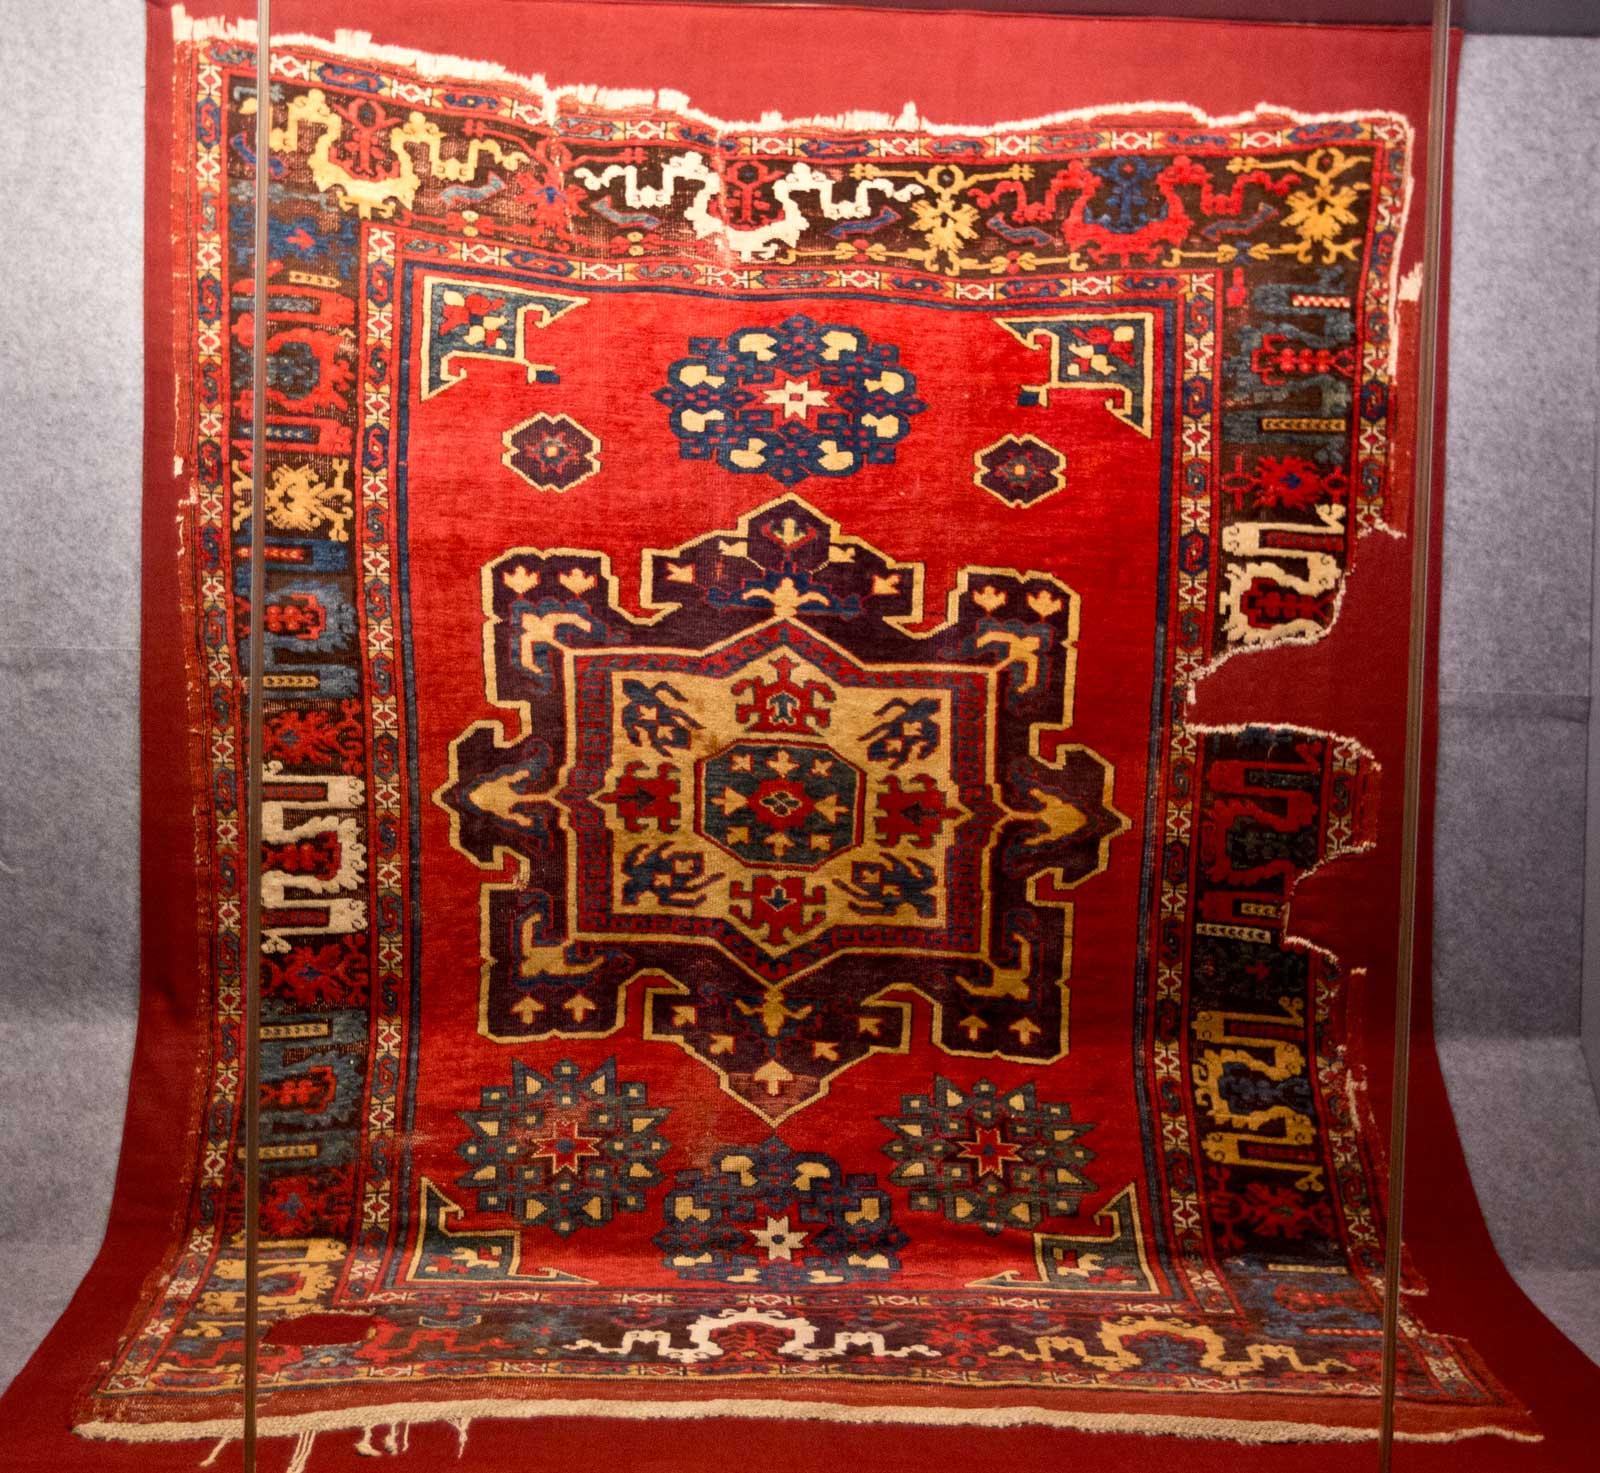 Early Karaman workshop carpet of 15th century, Central Anatolia Vakiflar Museum